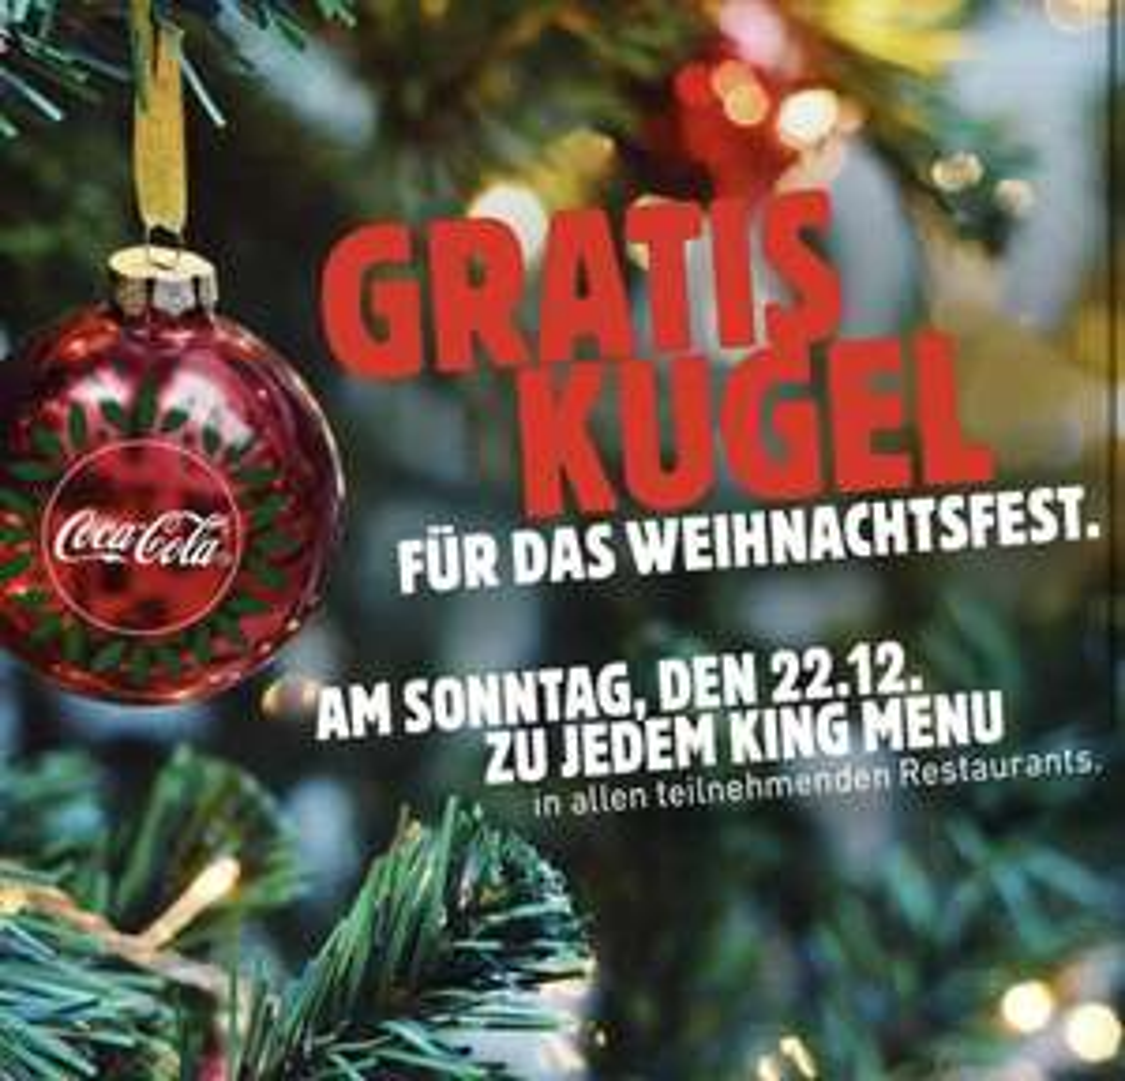 Burger King Gratis Coca Cola Weihnachtskugel zu jedem KING Menu